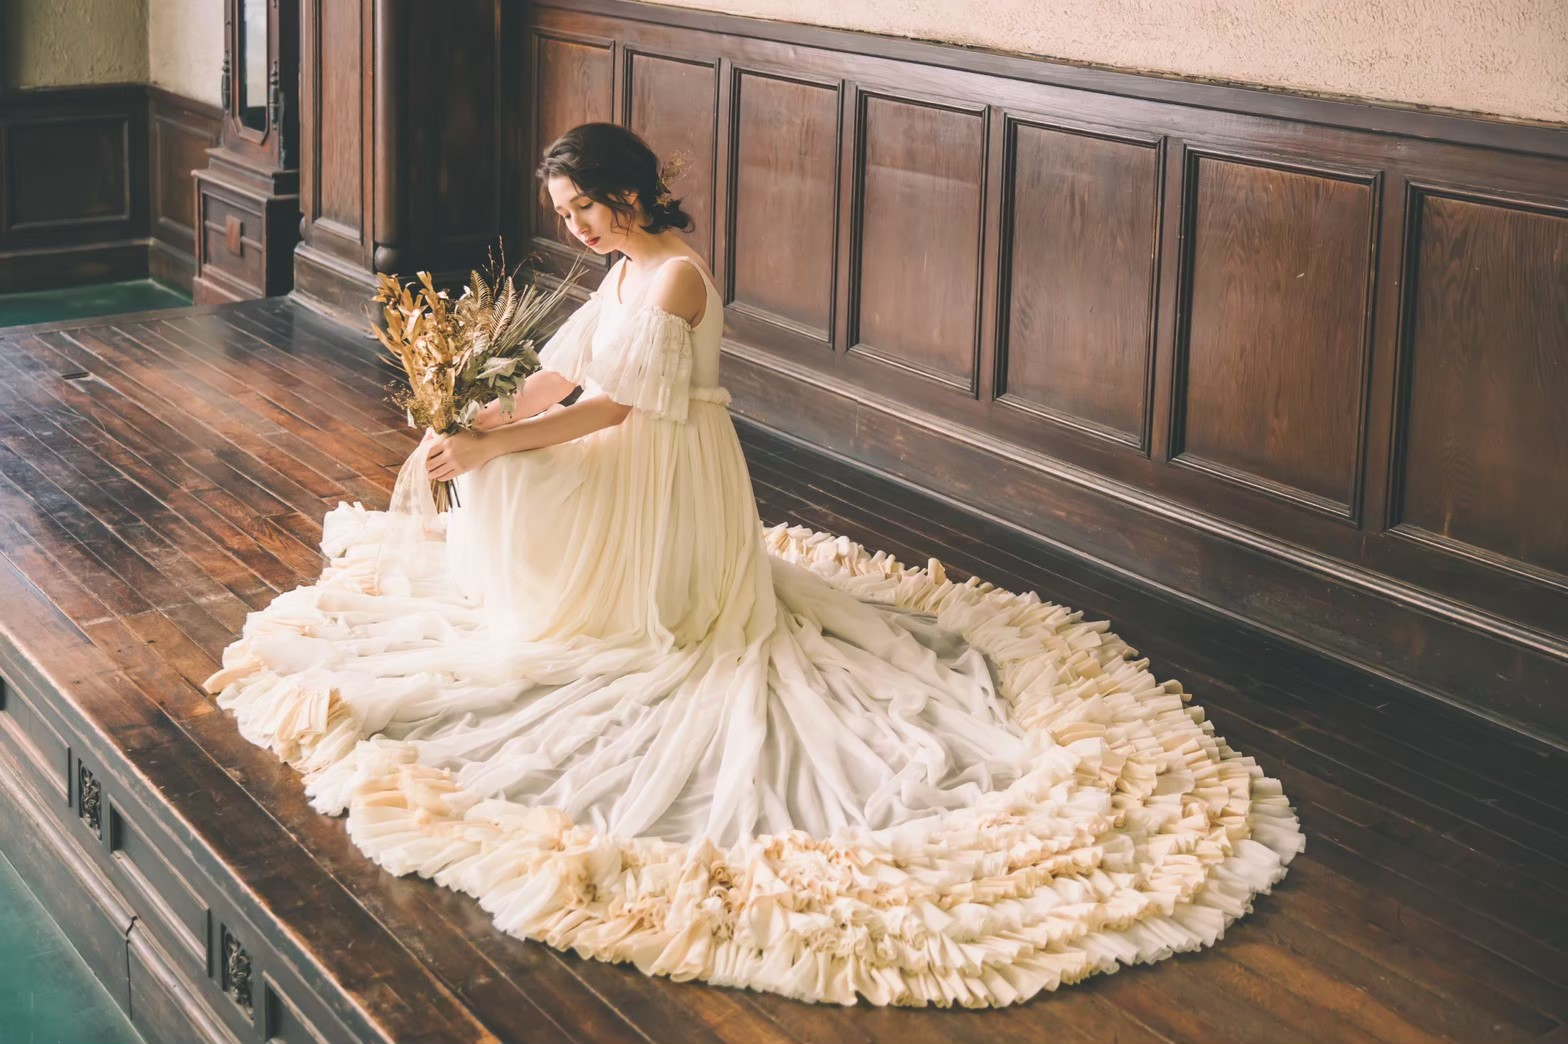 Rosey Aphrodina-本物志向のアンティークドレスとの出会い-